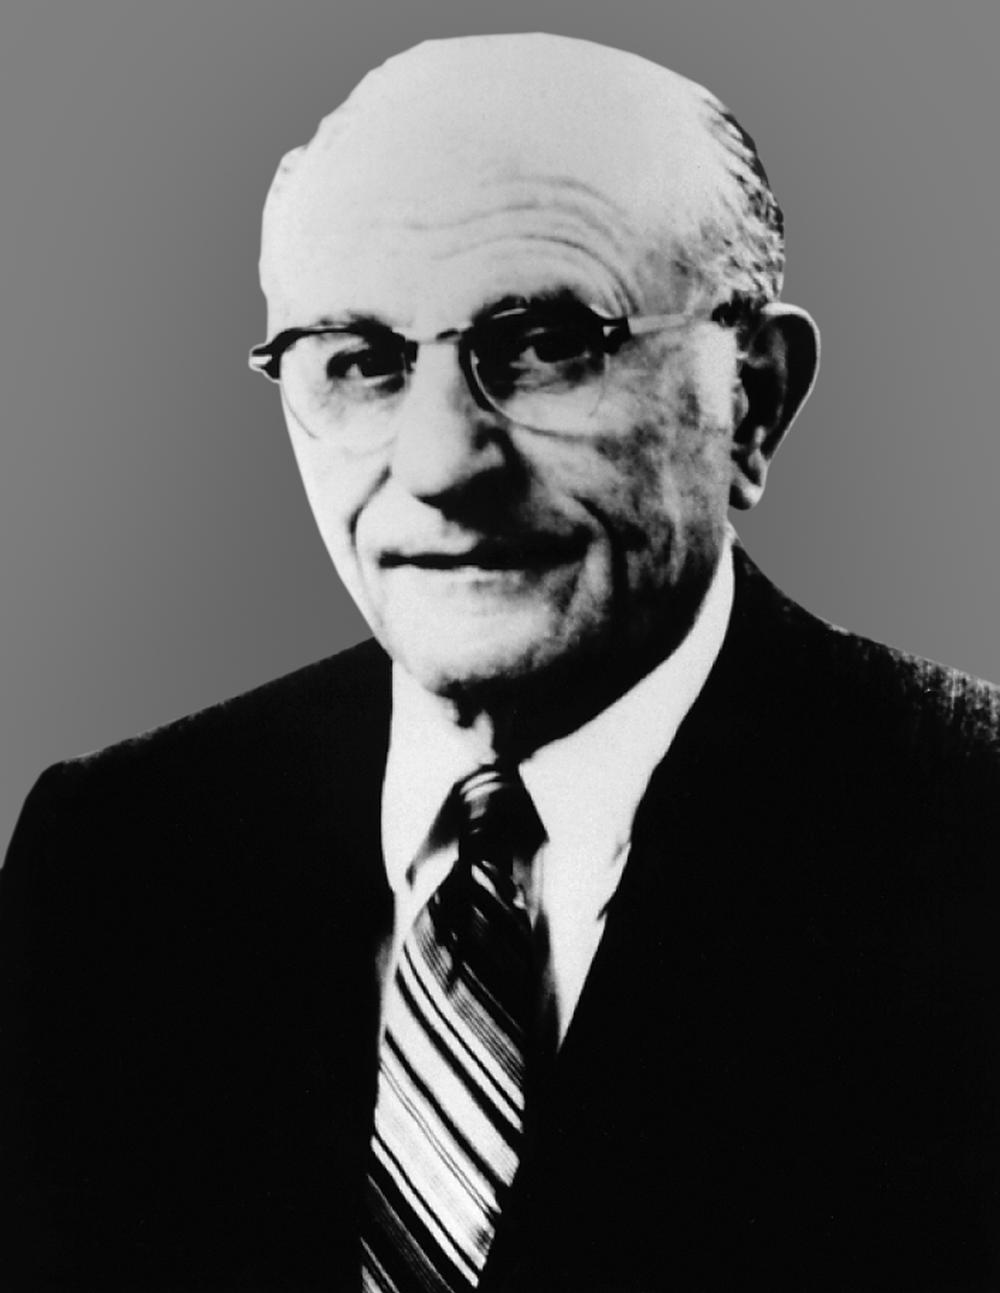 Hyman Meyers